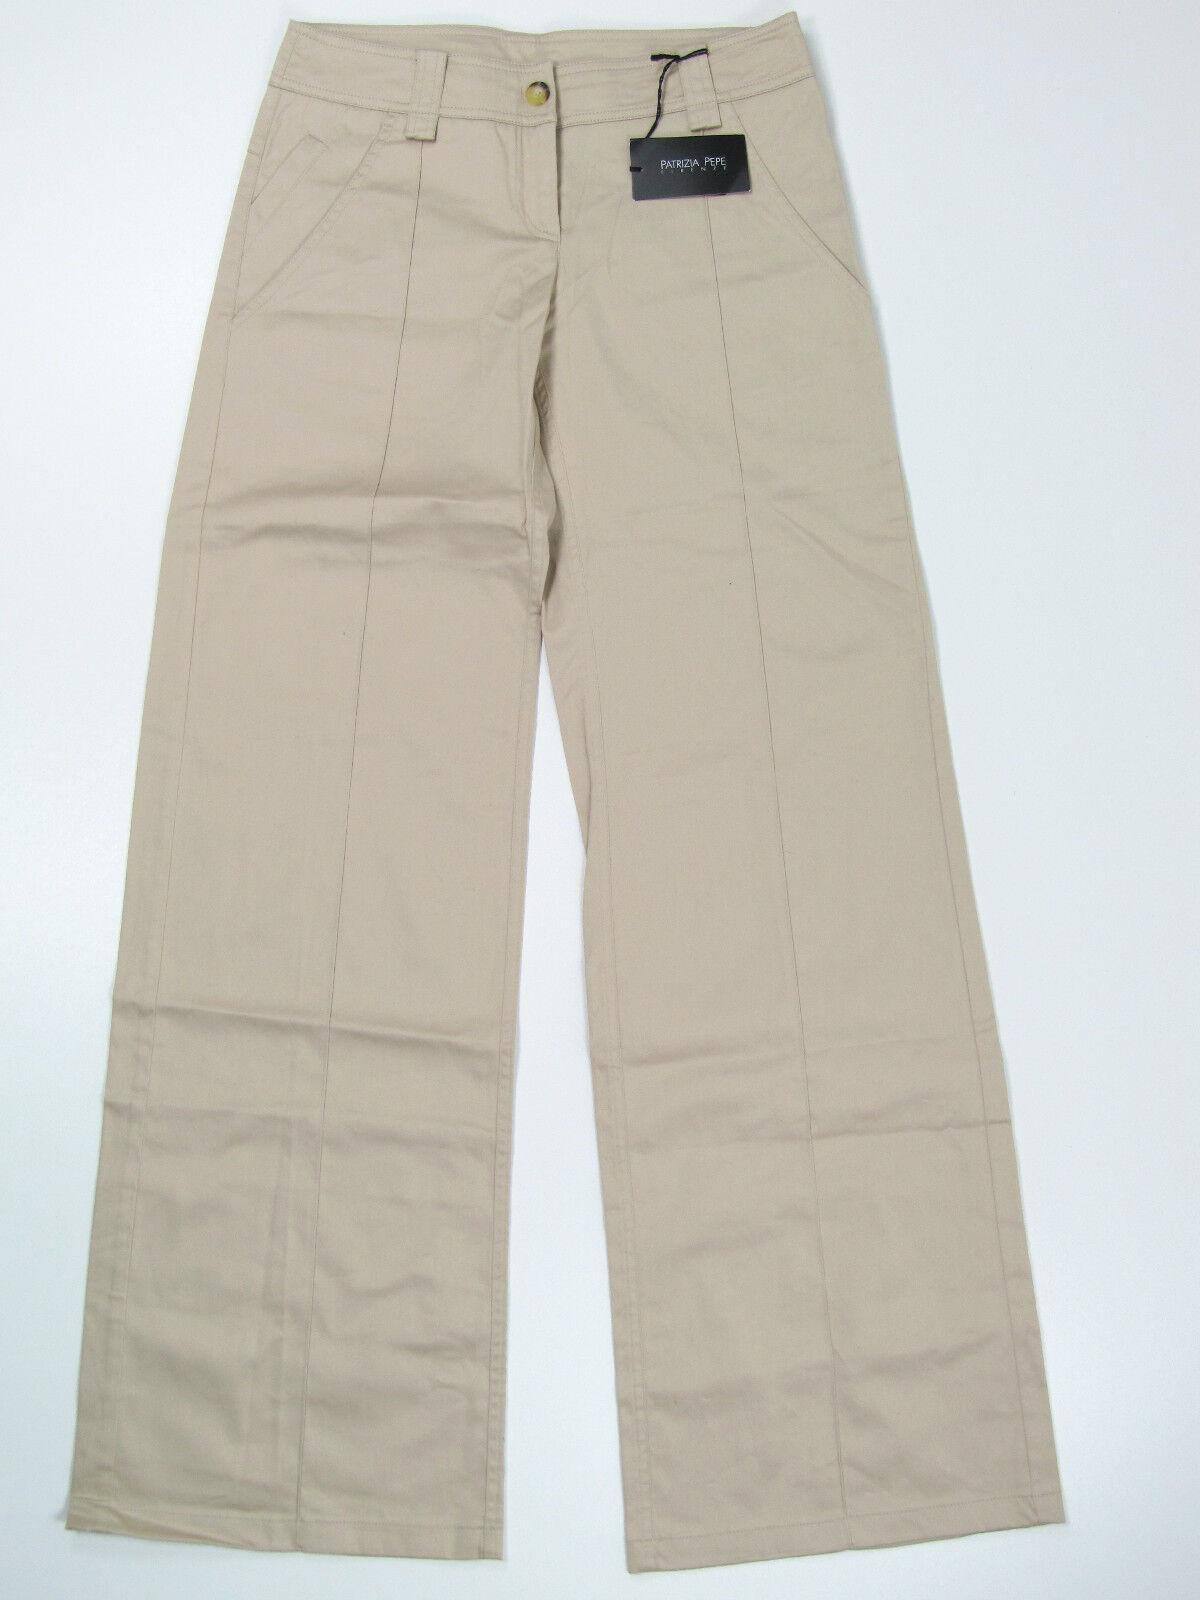 Patrizia Pepe Pantalon Hose Pants Jeans Neu 36 38